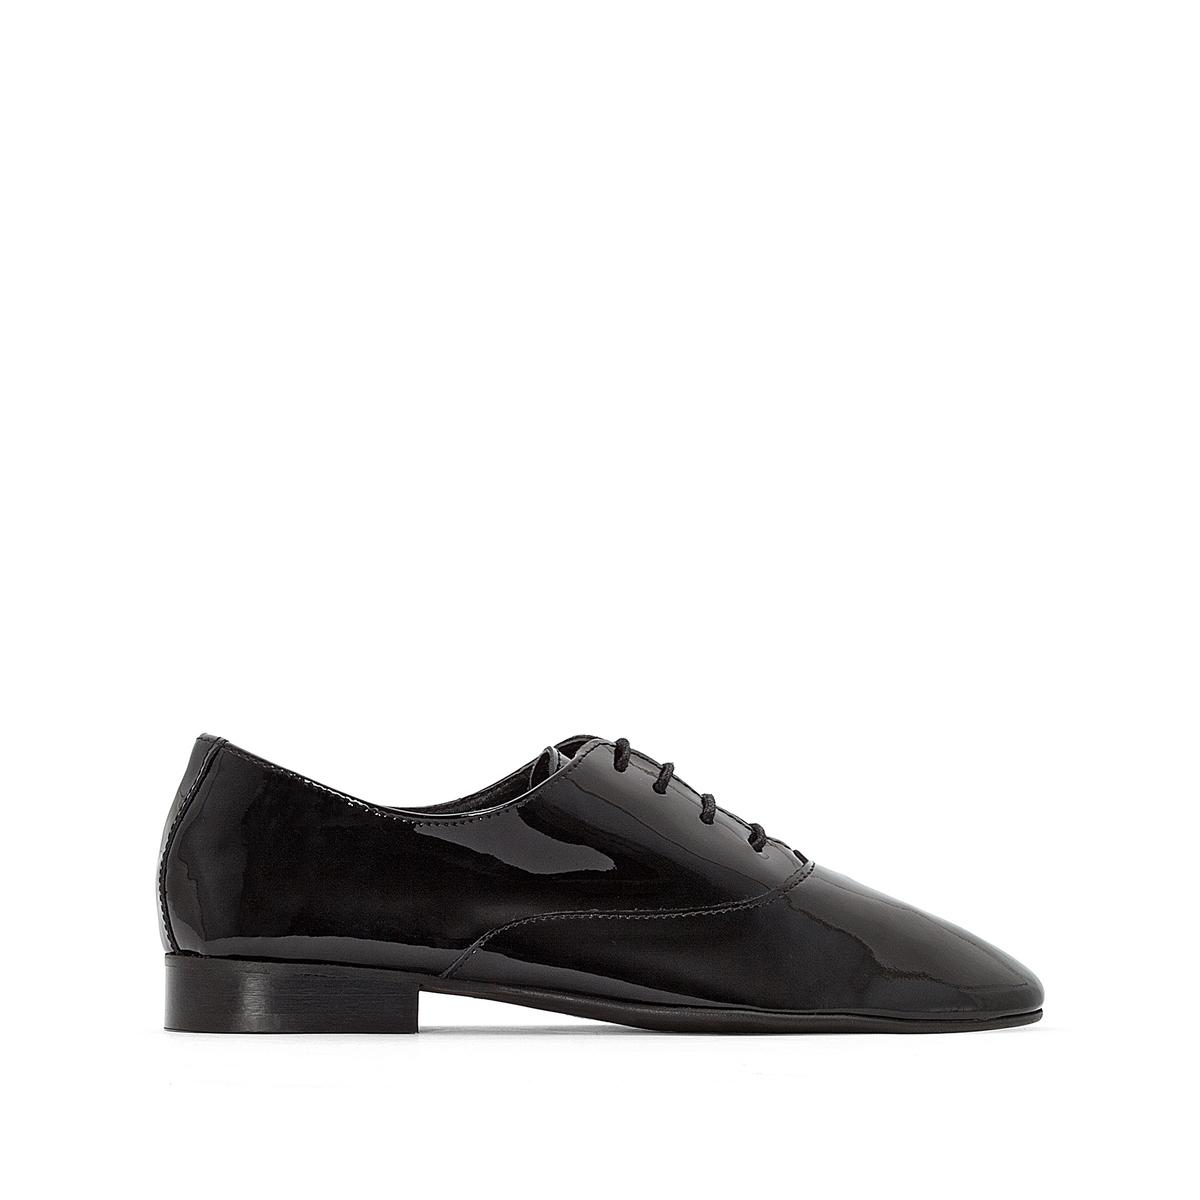 Ботинки-дерби из лакированной кожи ботинки дерби из мягкой кожи takarika